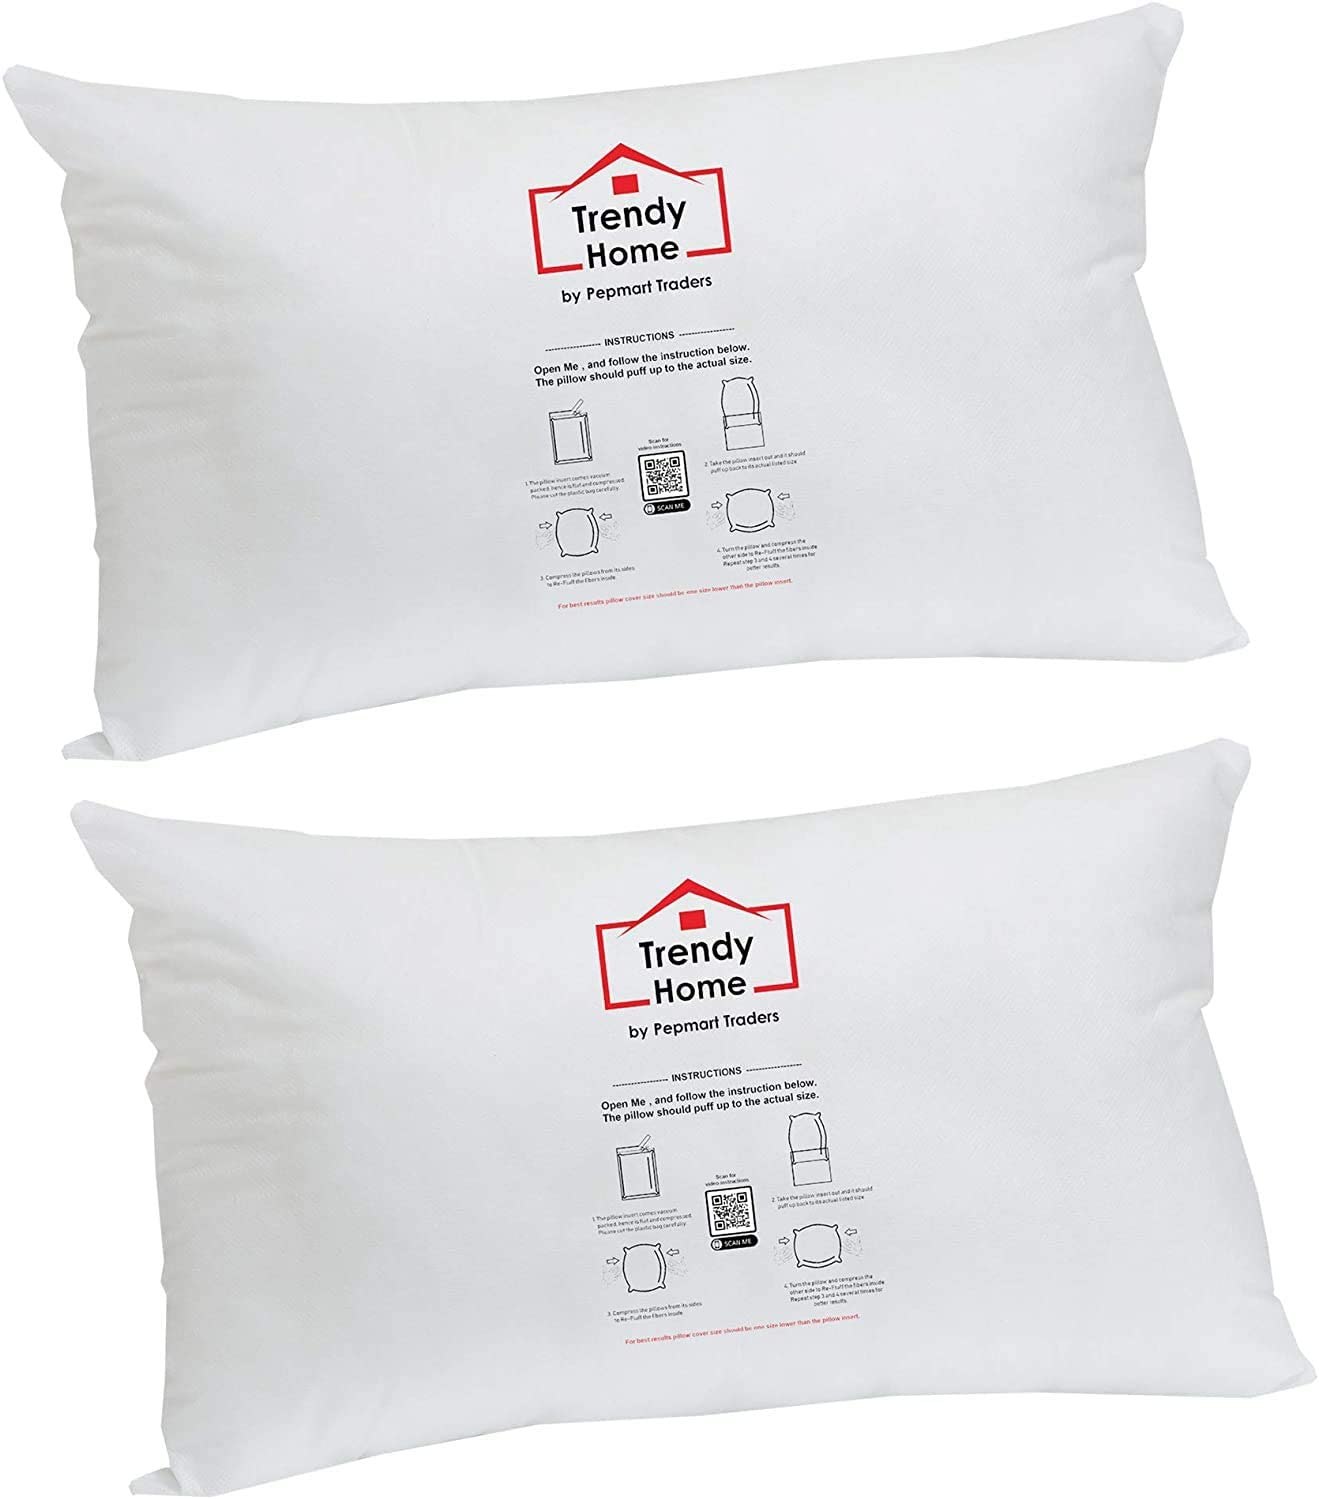 Trendy Home 12x18 Premium Hypoallergenic Stuffer Home Office Decorative Throw Pillow Insert, Standard/White 12x18(2pack)